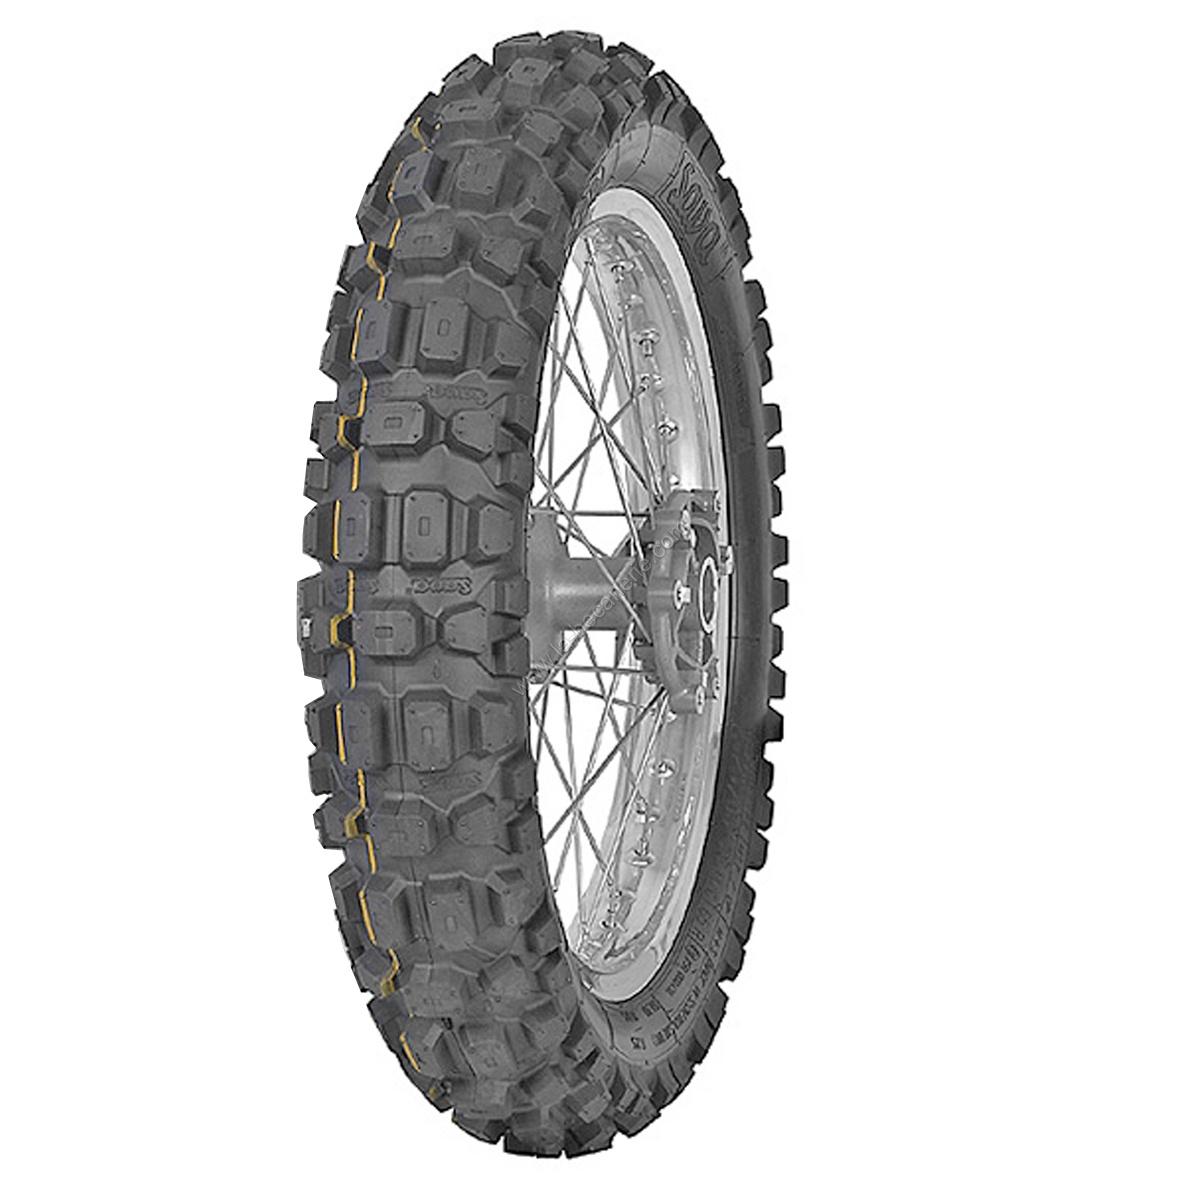 pneu 110 80 18 58p sava mc23 rockrider m caboite pneus sava. Black Bedroom Furniture Sets. Home Design Ideas